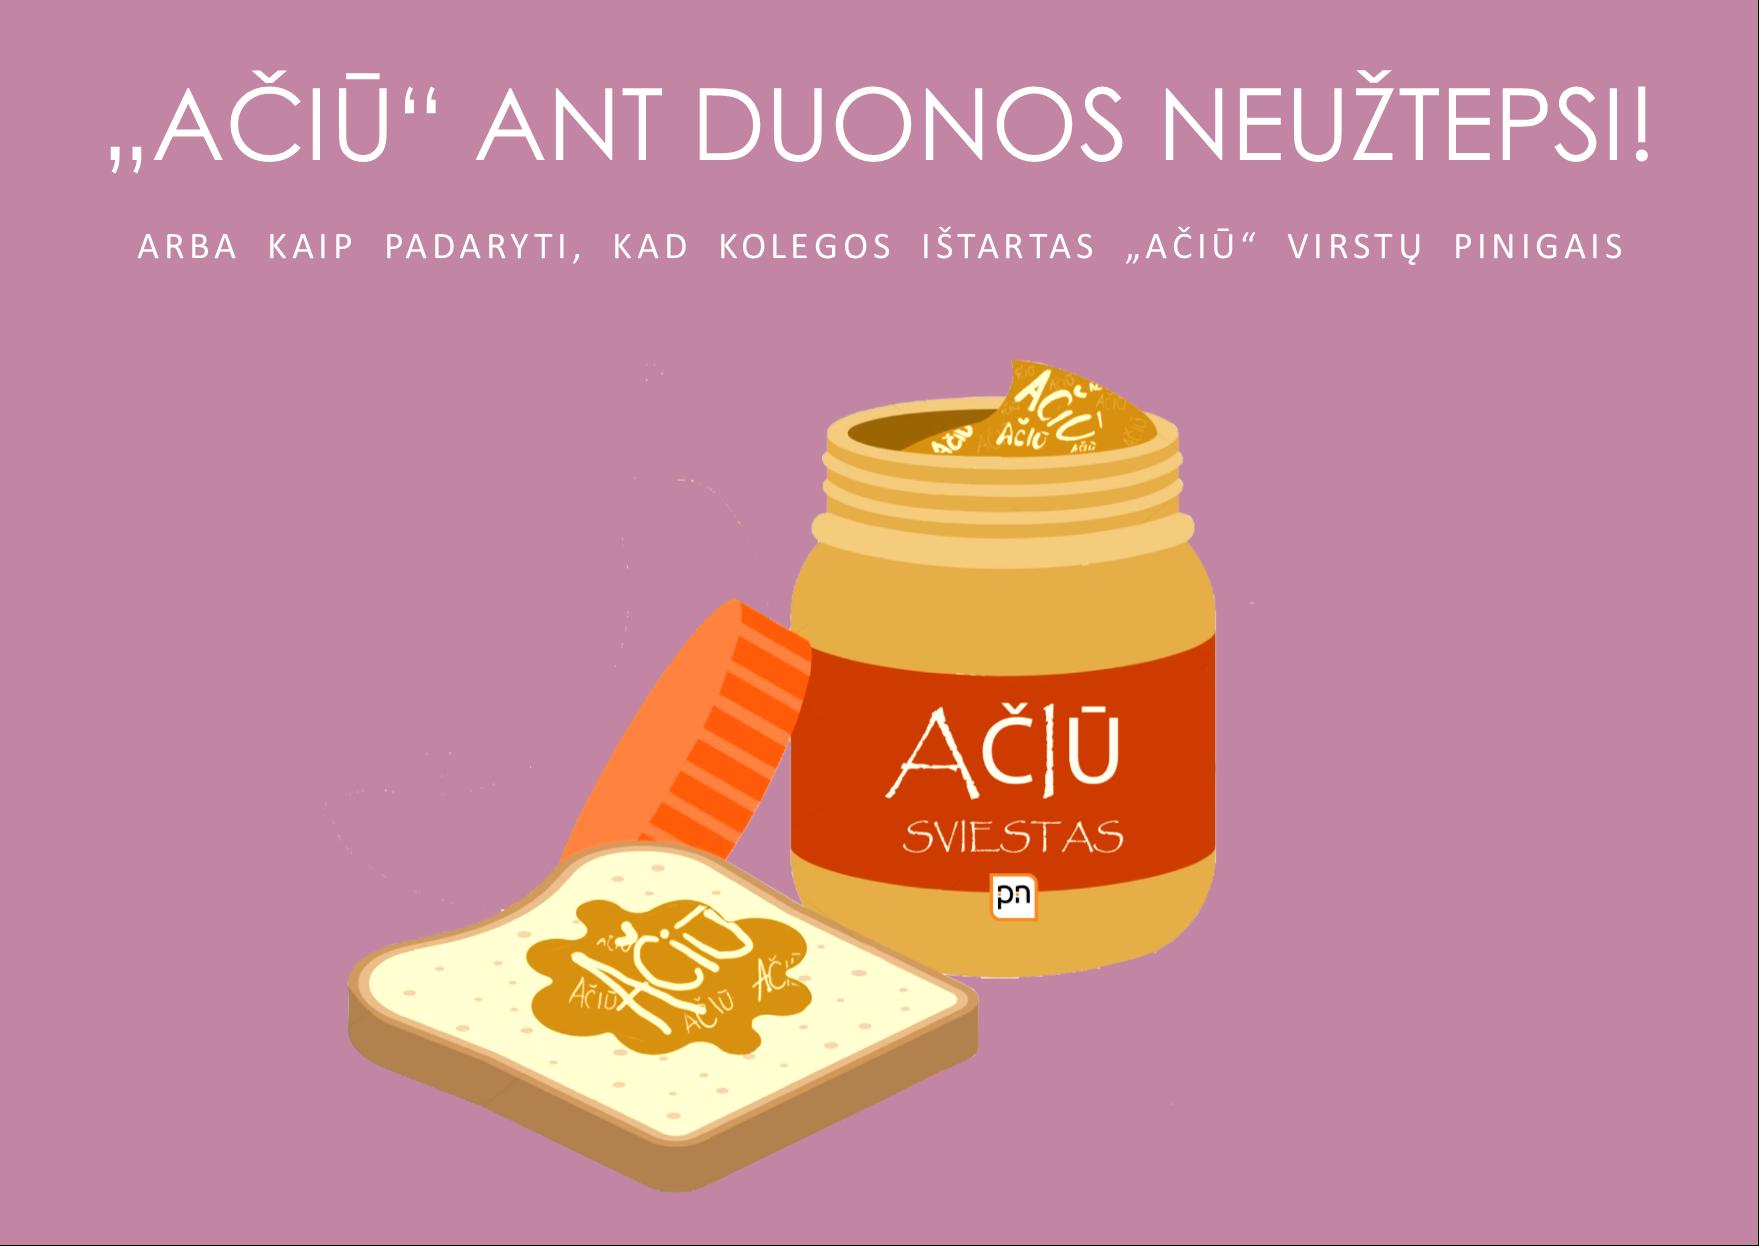 ACIU_ANT_DUONOS_NEUZTEPSI_2.png